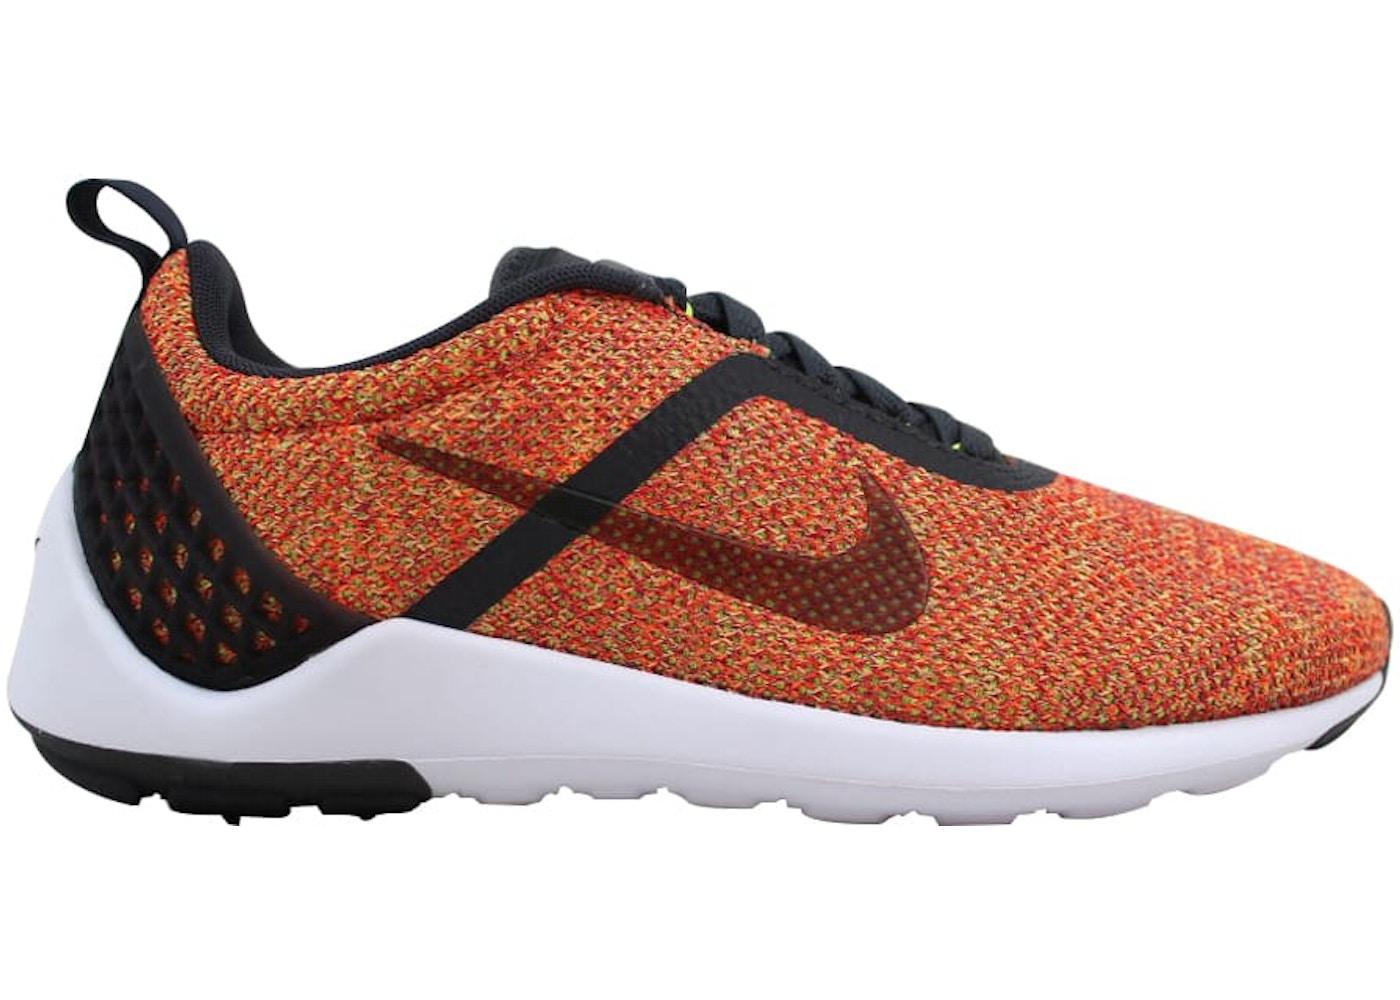 newest ebec0 5b4a8 Nike Lunarestoa 2 SE Bright Crimson